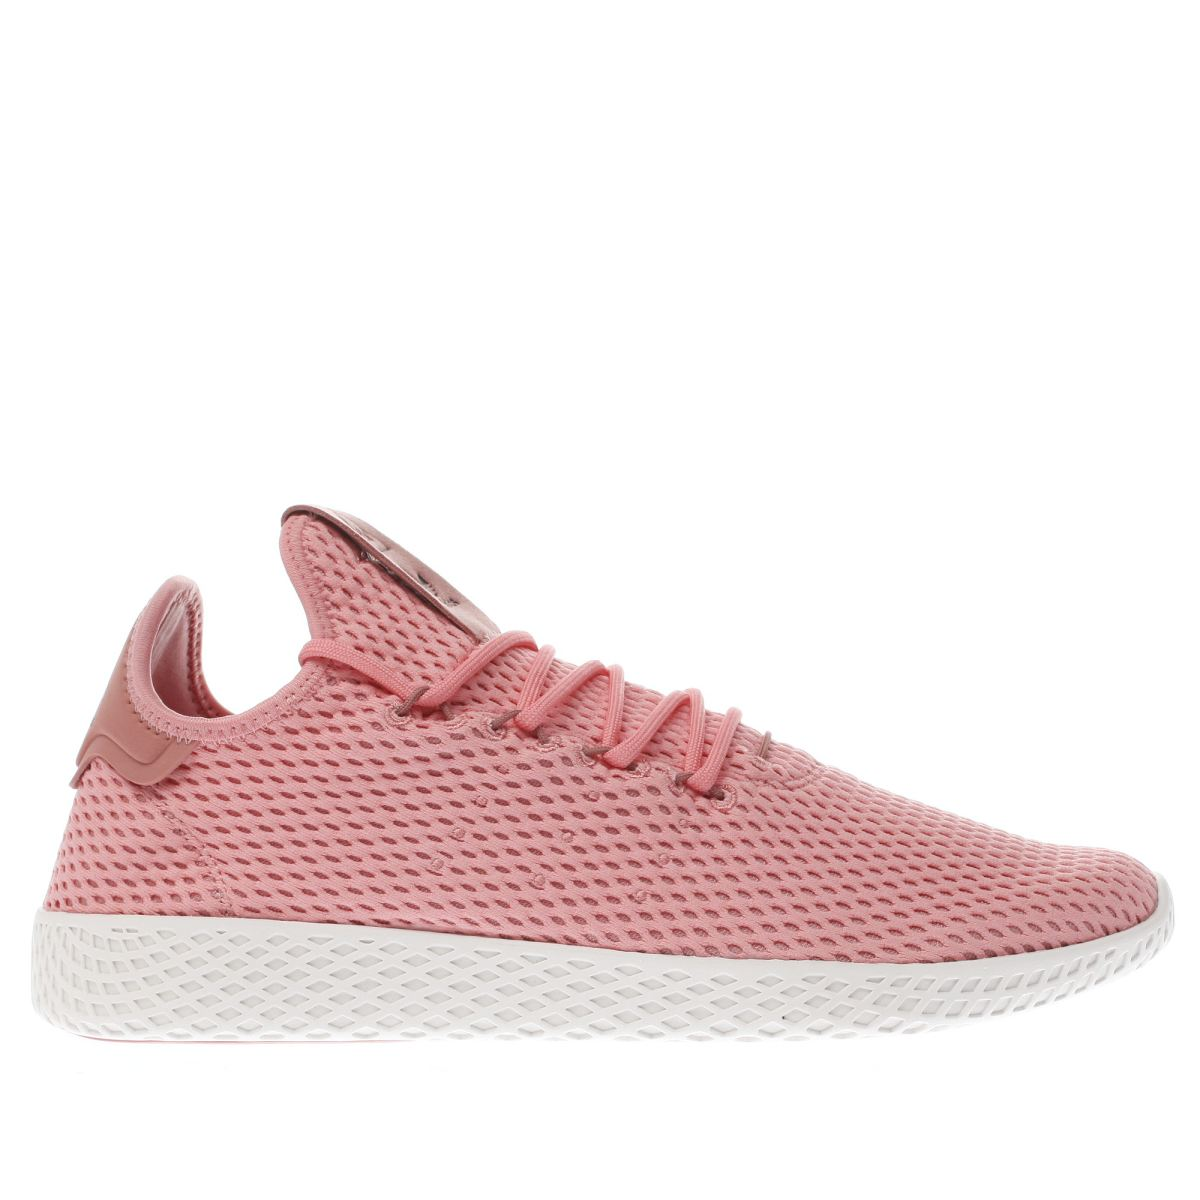 adidas pink pharrell williams tennis hu trainers